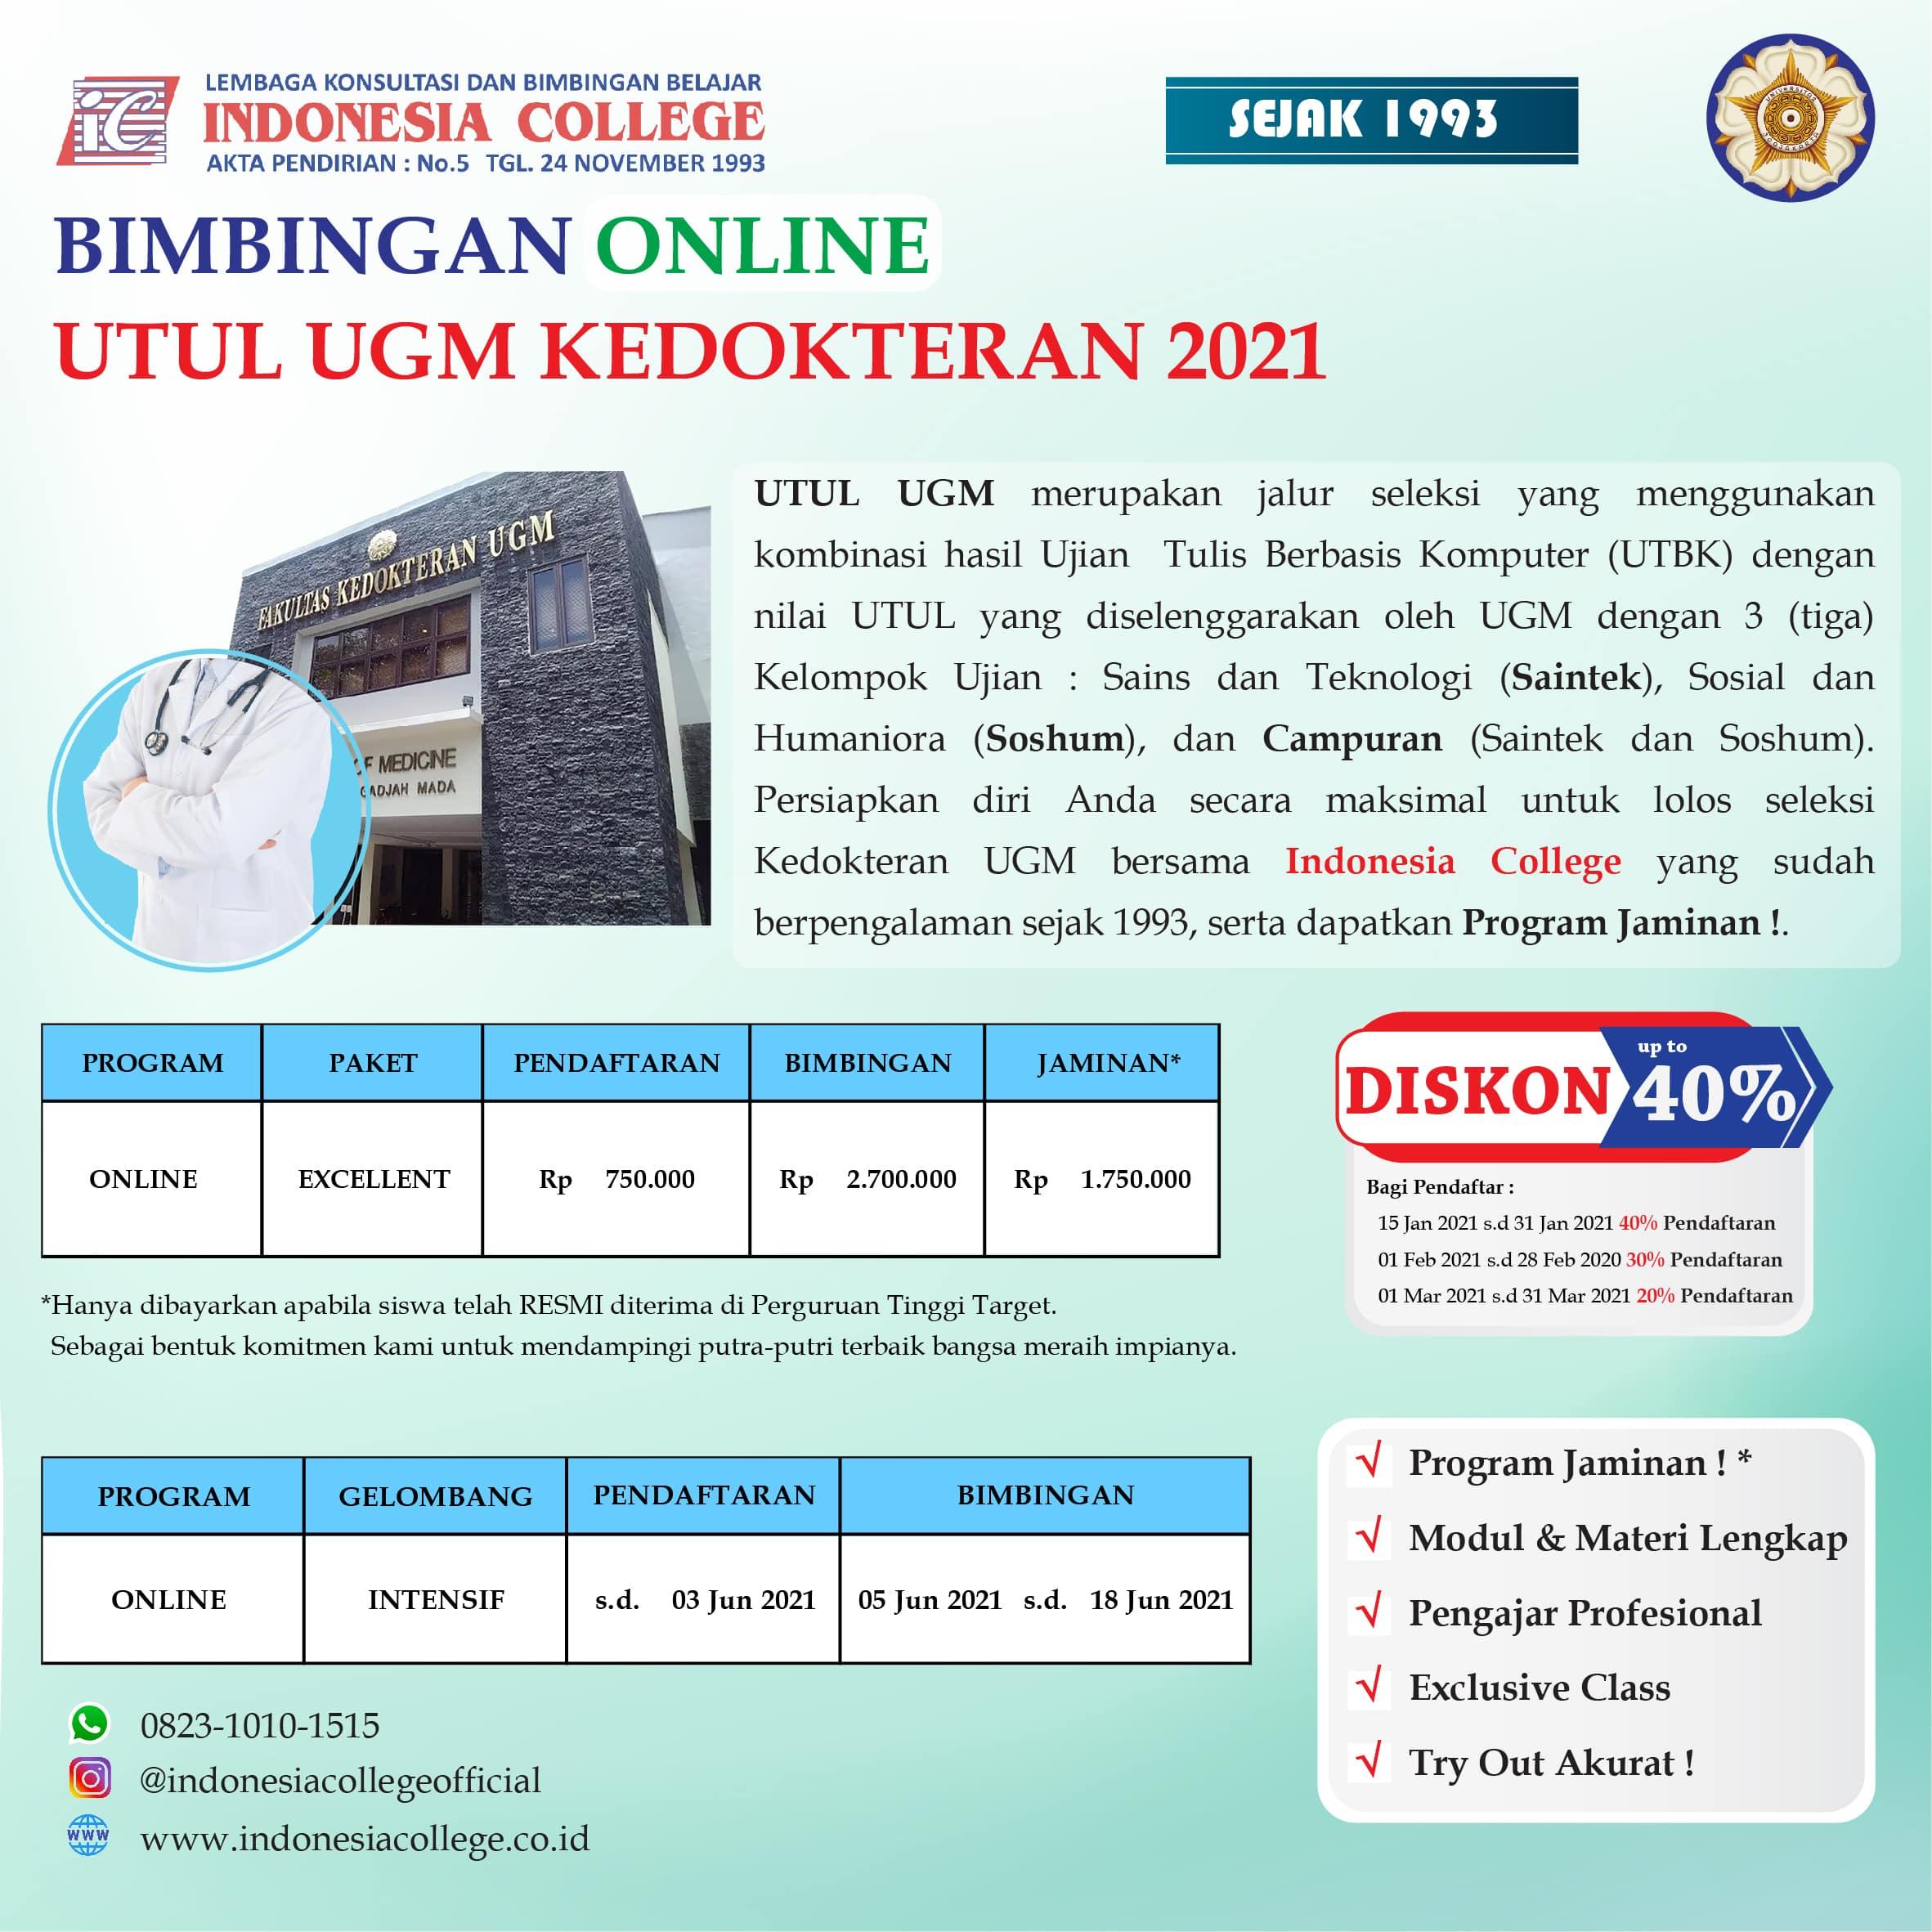 BIMBEL UTUL UGM 2021 (HARGA) PART-05 ONLINE-min